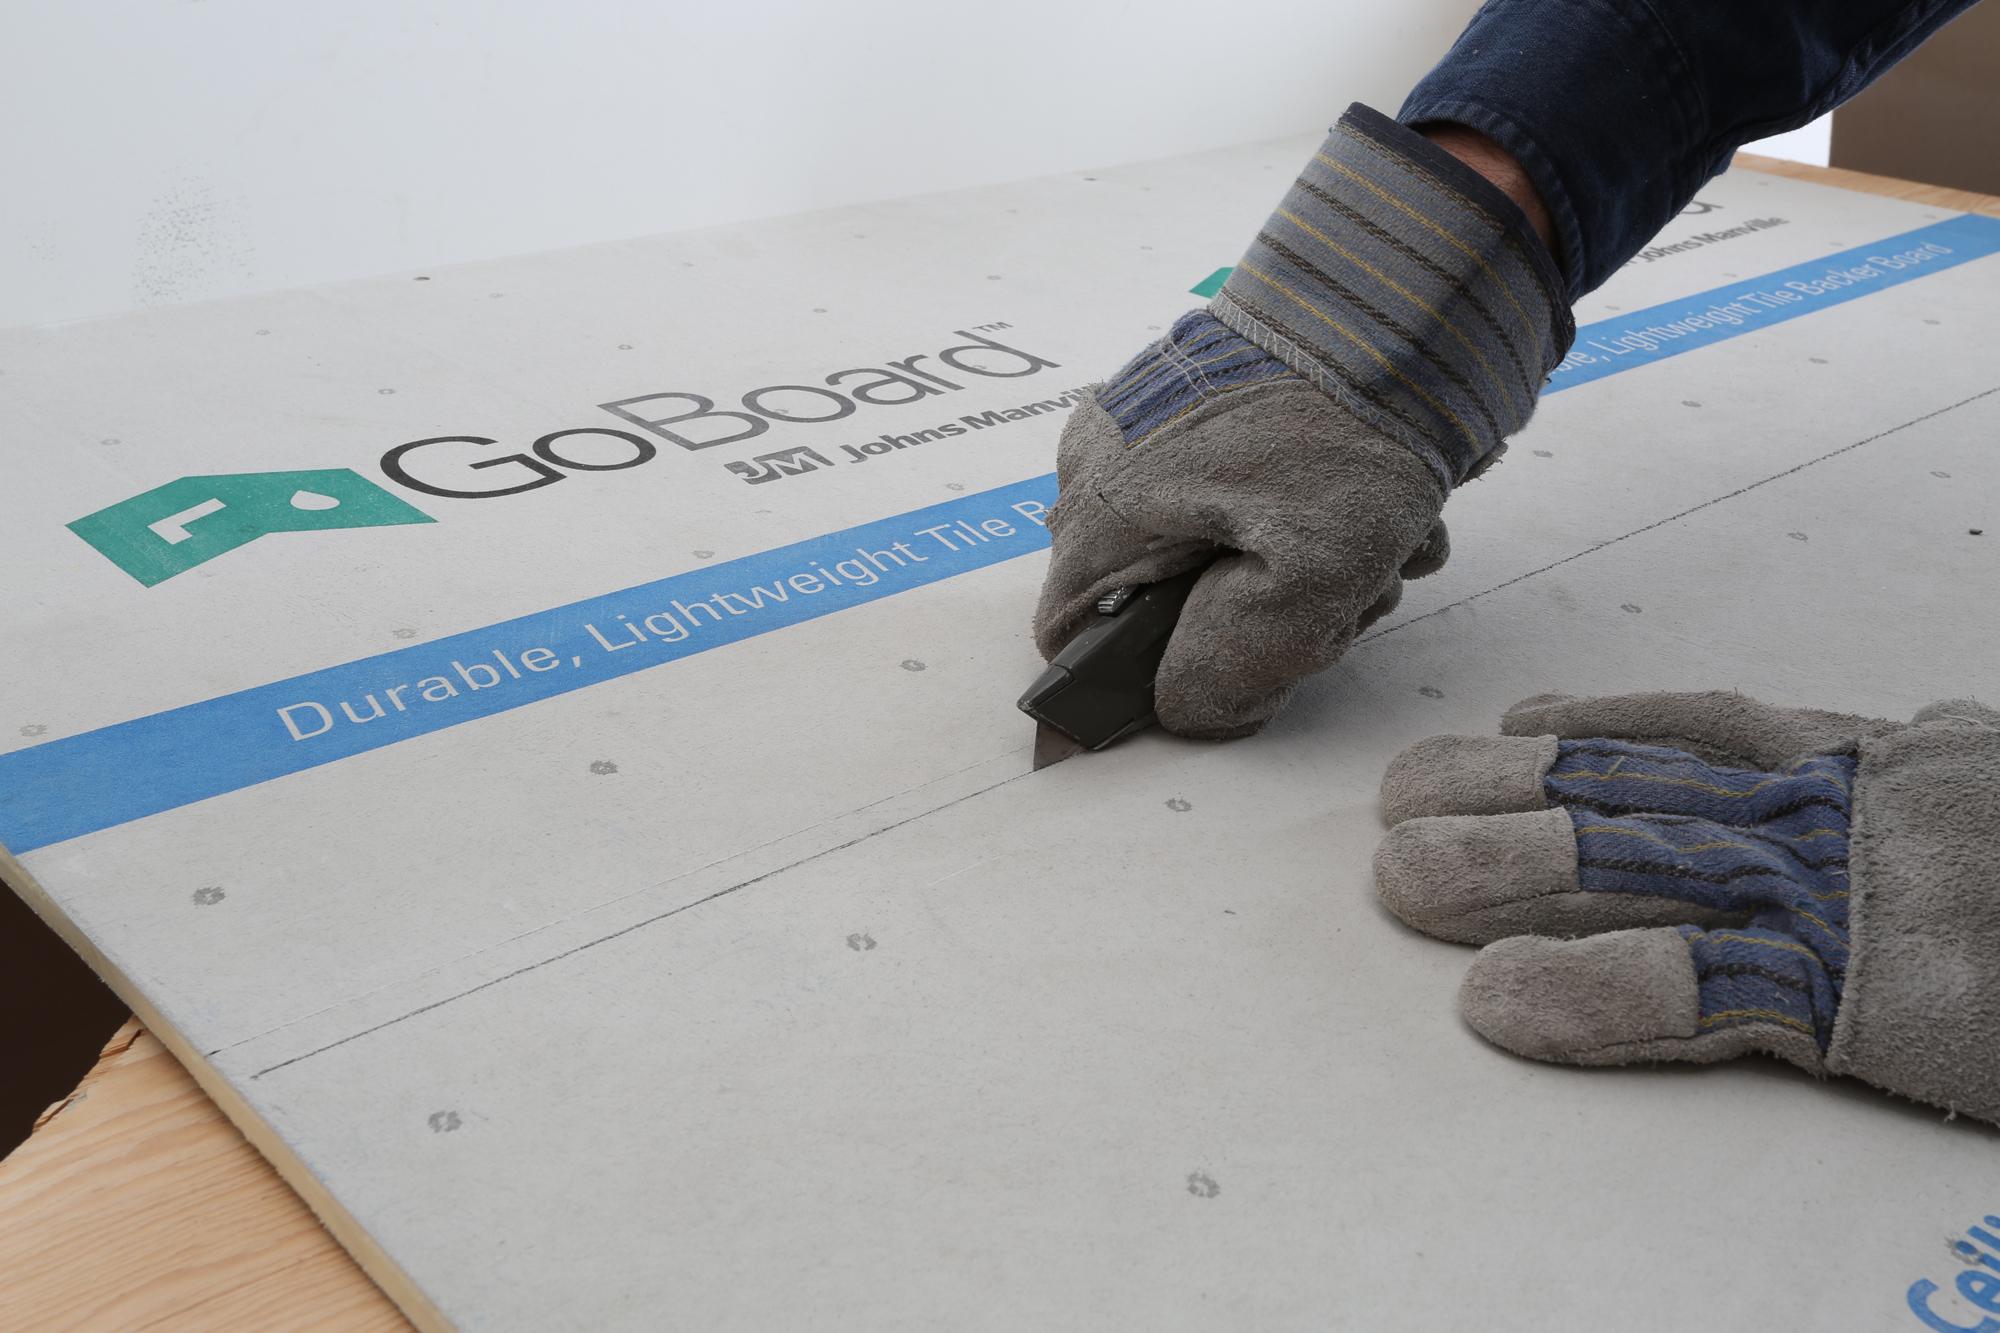 Lightweight tile backer jlc online moisture barriers tile lightweight tile backer jlc online moisture barriers tile walls shower bath kitchen johns manville dailygadgetfo Gallery